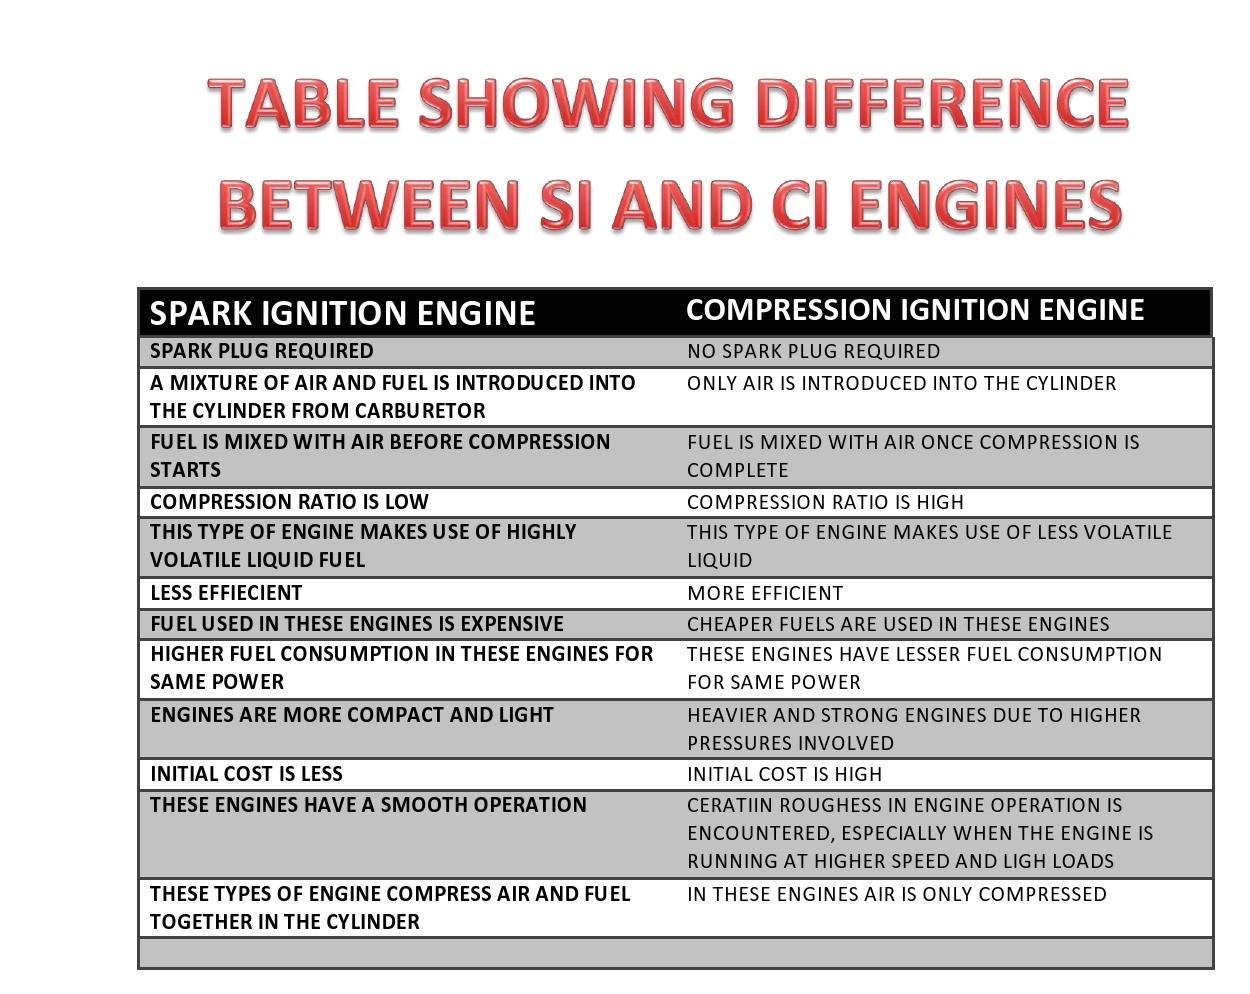 2 Cycle Oil Mix Ratio Chart Basics Of Marine Engineering Engine Classification